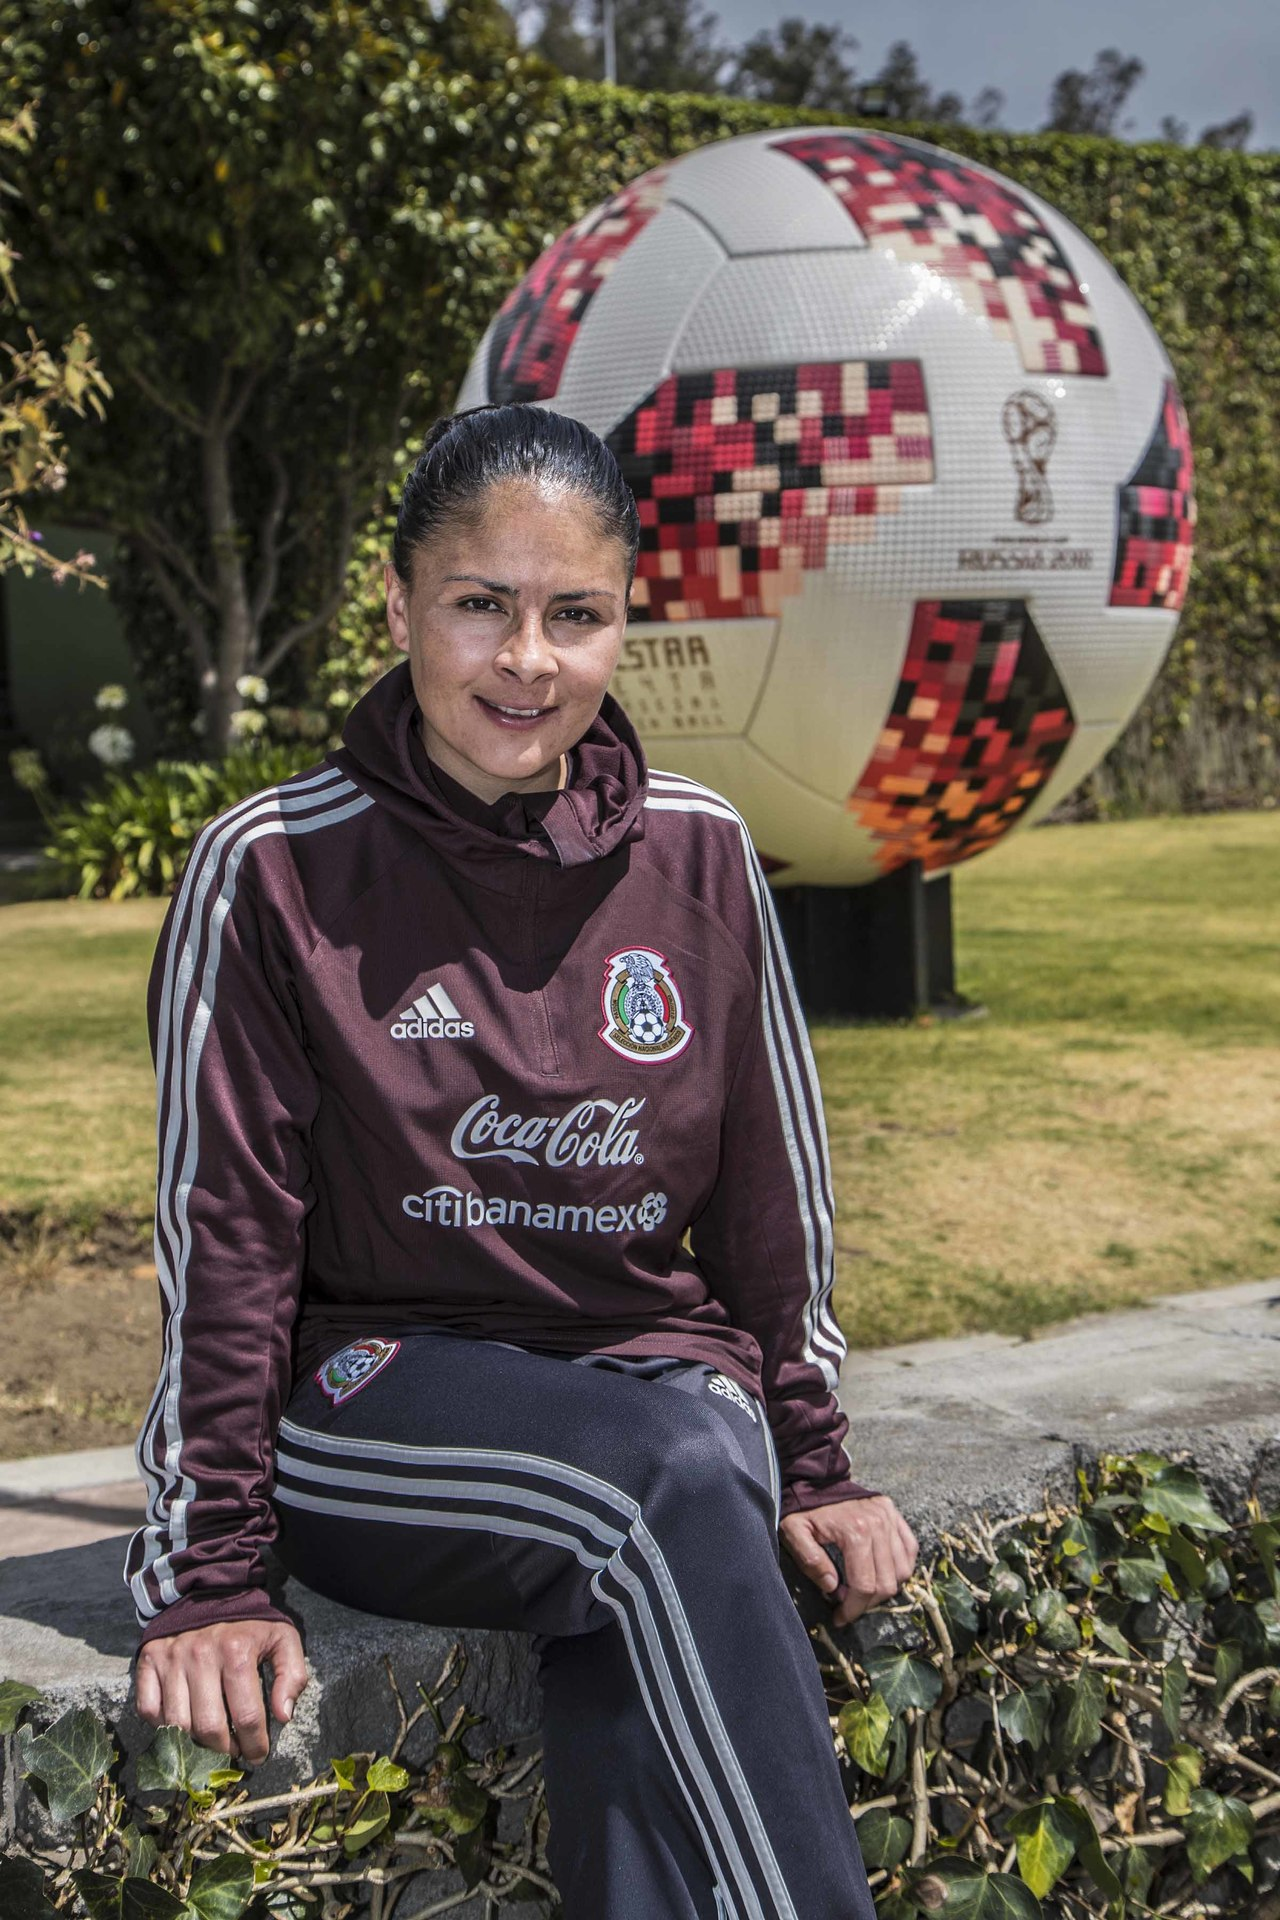 Extranjeras en Liga Femenil podría ser benéfico